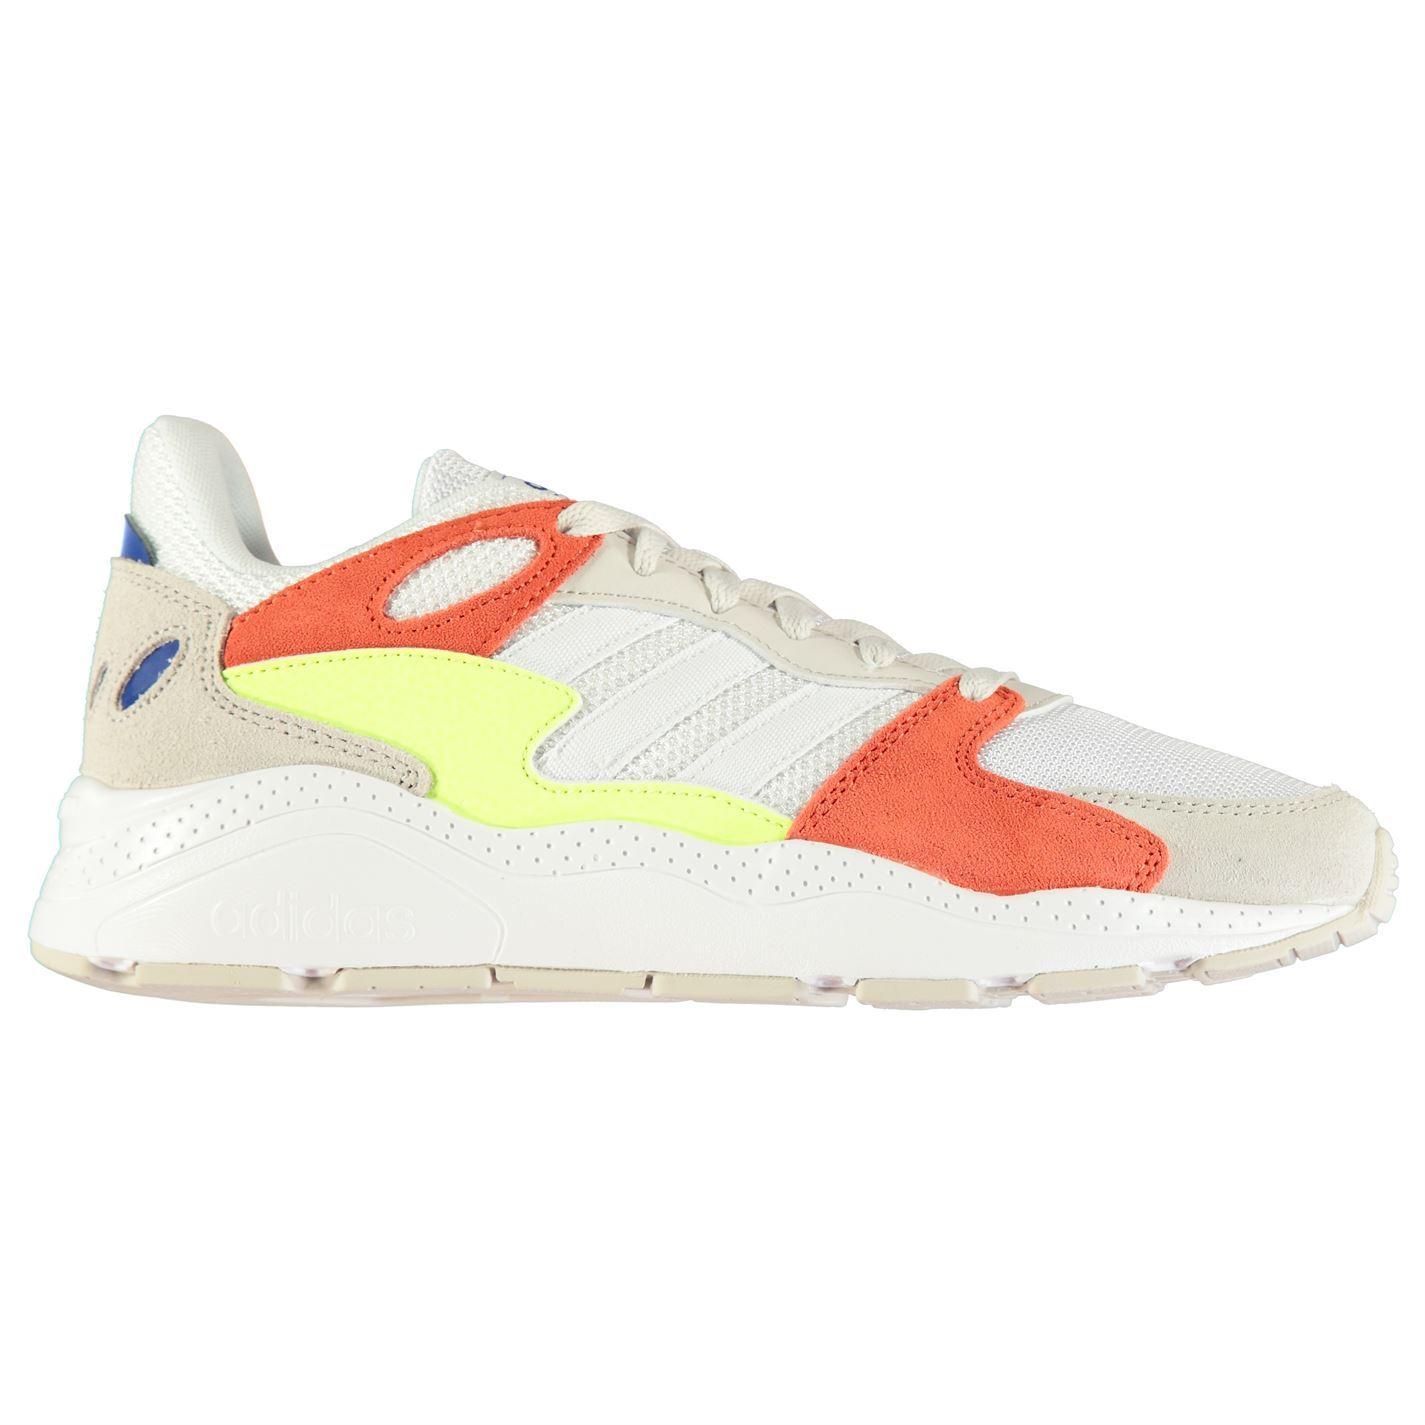 Adidas-Crazychaos-Baskets-Homme-Chaussures-De-Loisirs-Chaussures-Baskets miniature 25